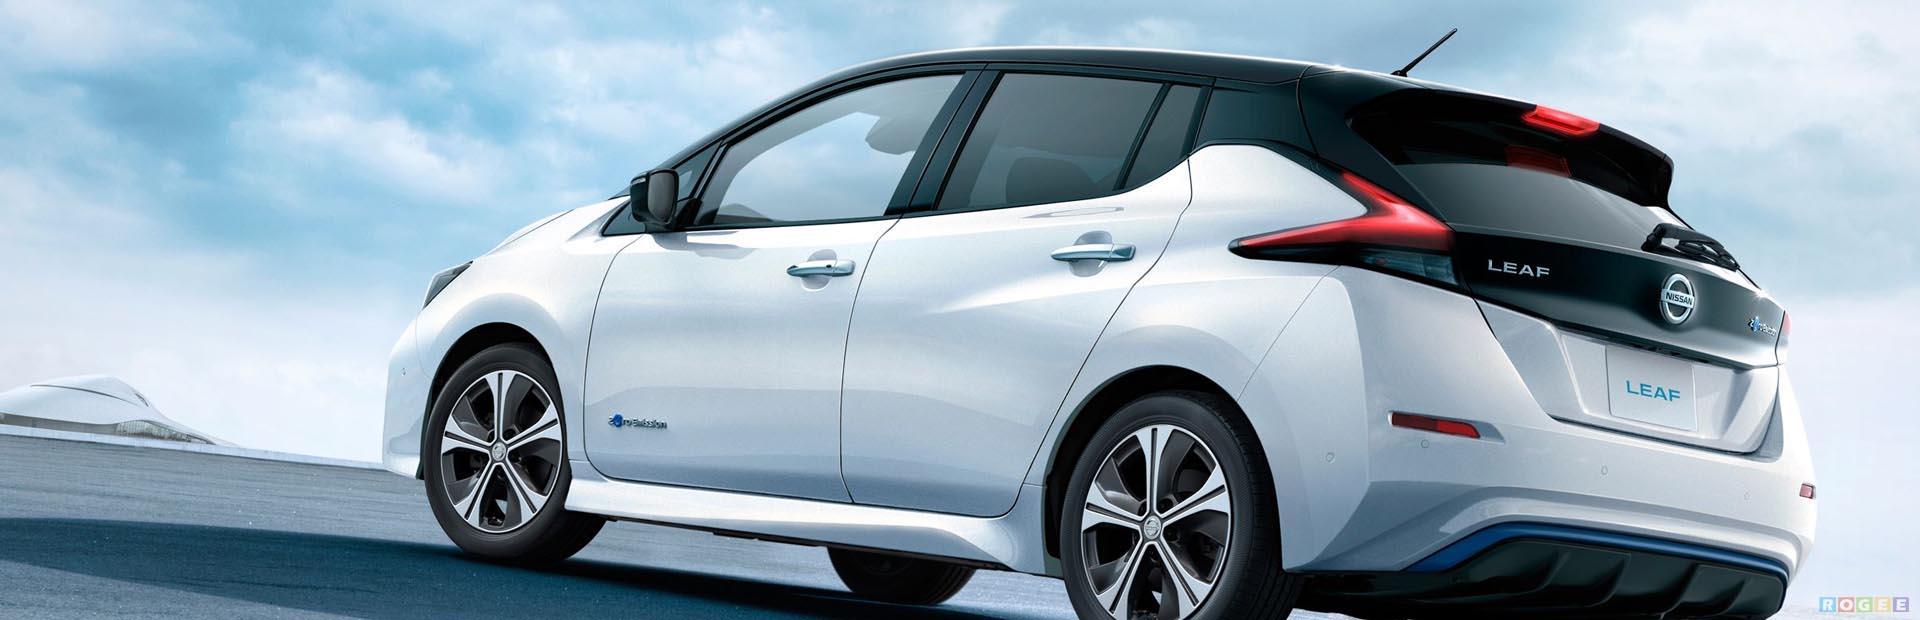 Bender Nissan Maximum Total Savings Mts Manufacturer New